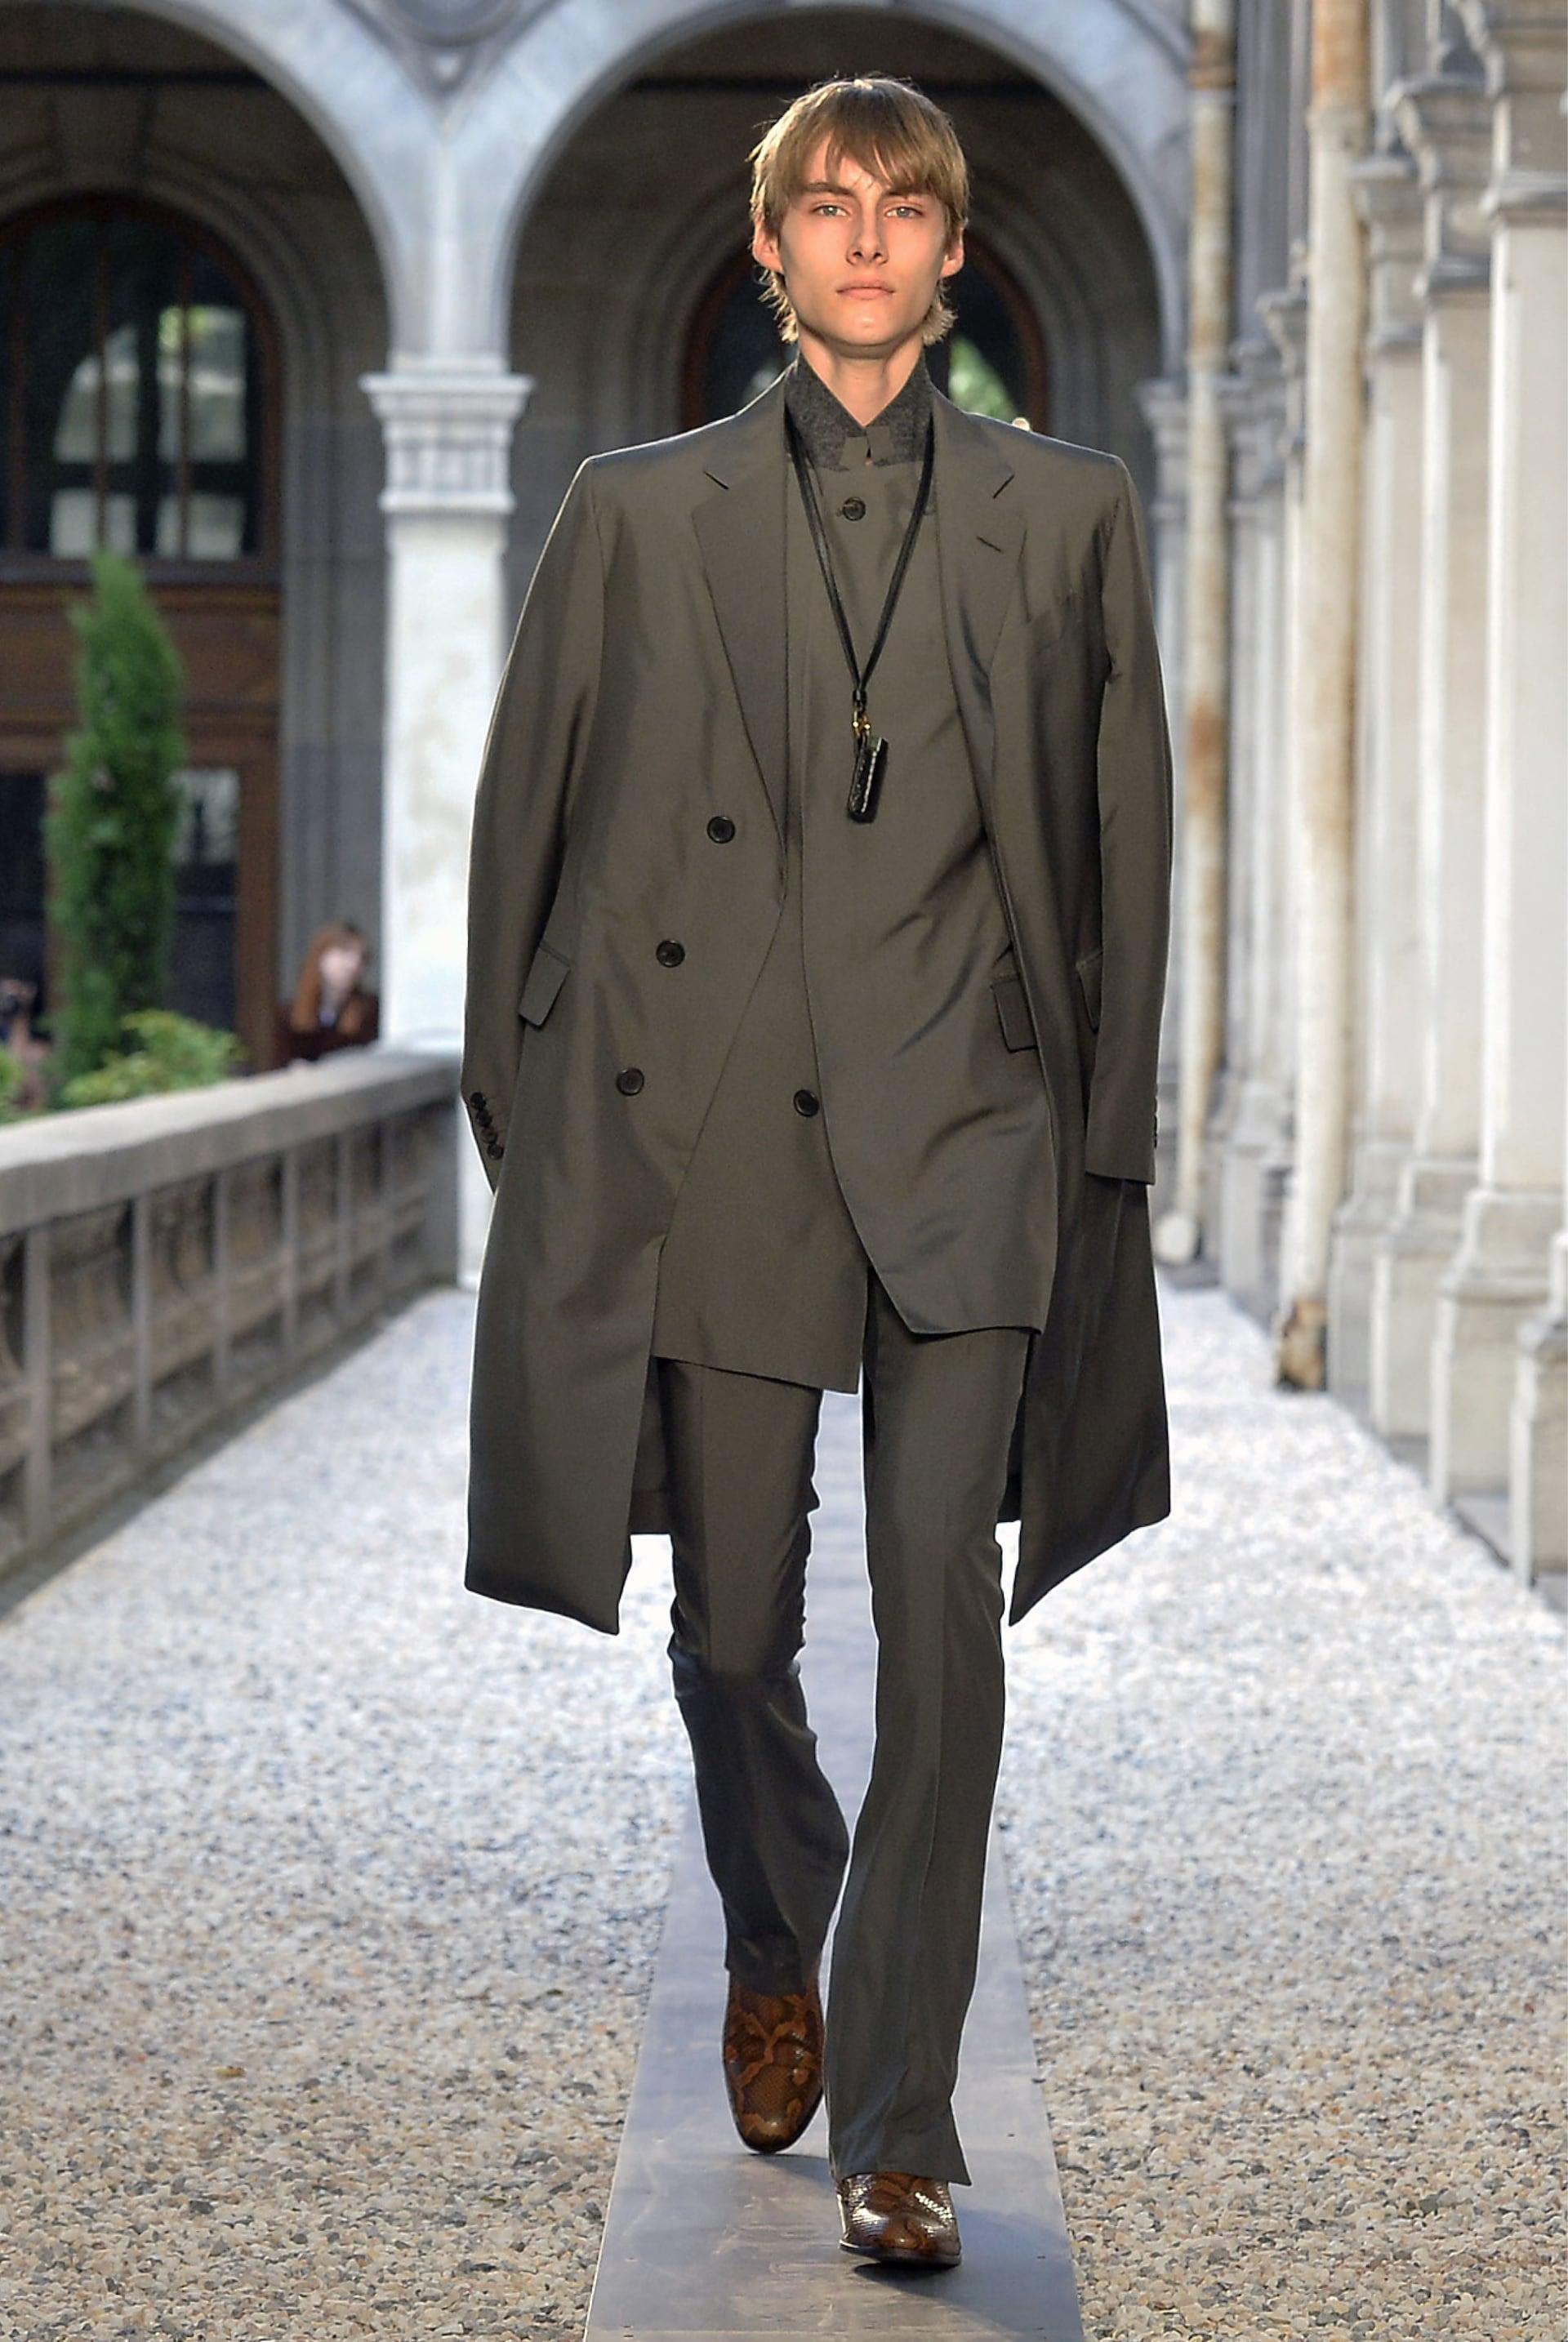 4db4b03b9 SS 2019 Looks | Men's Fashion Week Paris | dunhill Online Store